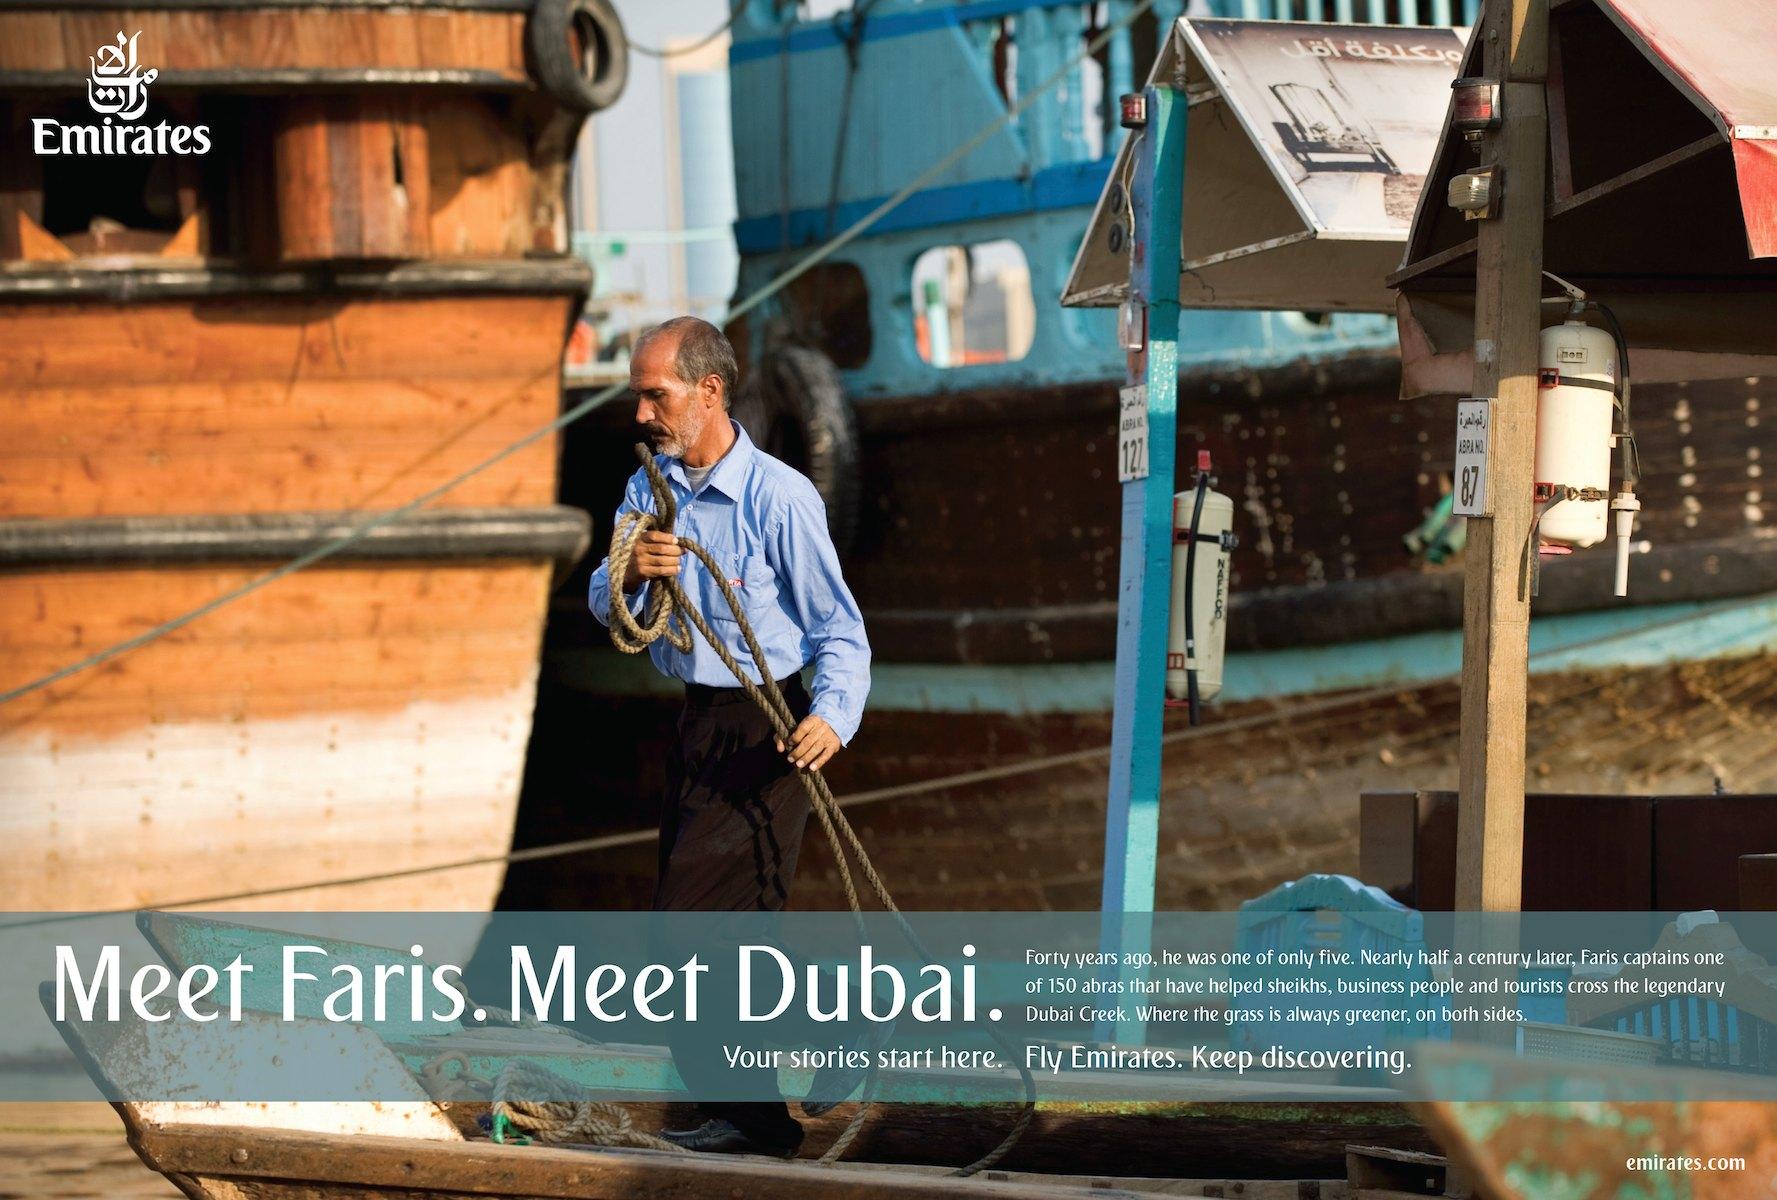 EK Meet Dxb Faris Final.jpg